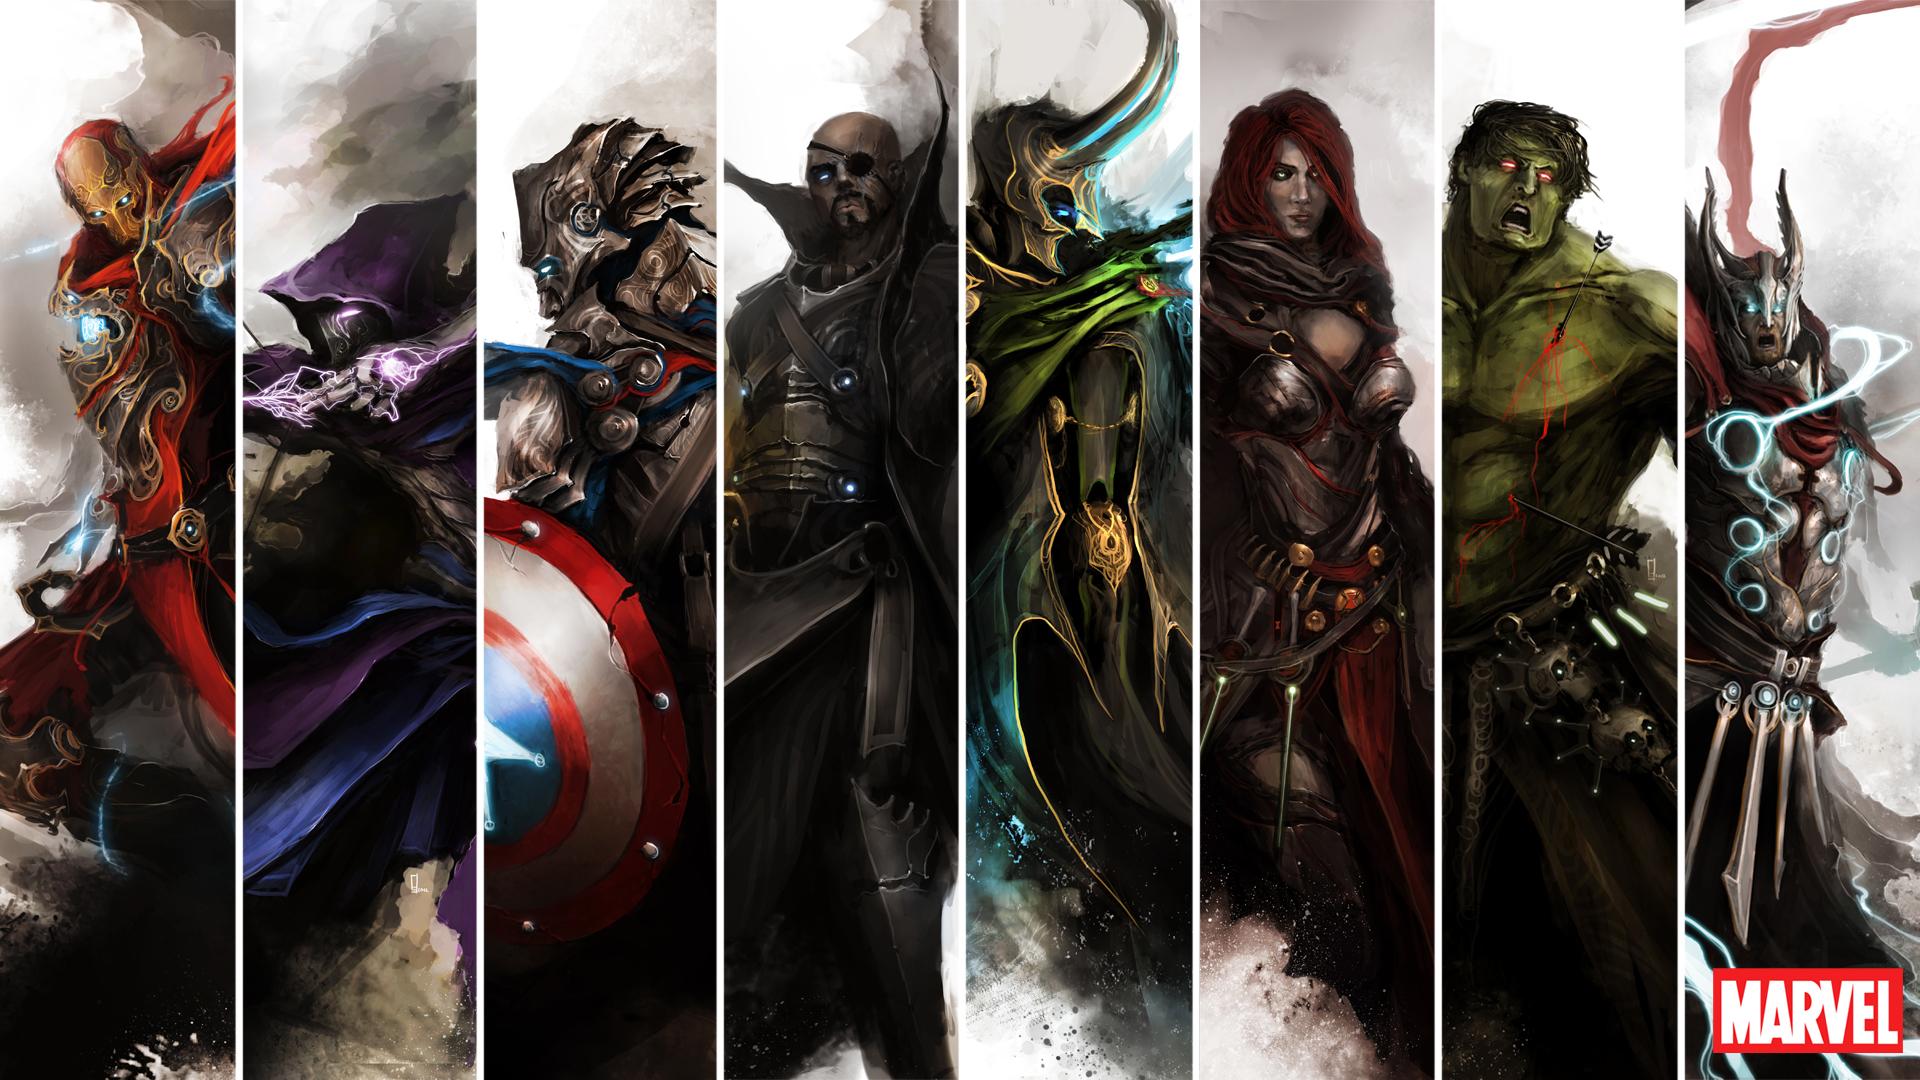 THE AVENGERS as Medieval Fantasy Warriors — GeekTyrant